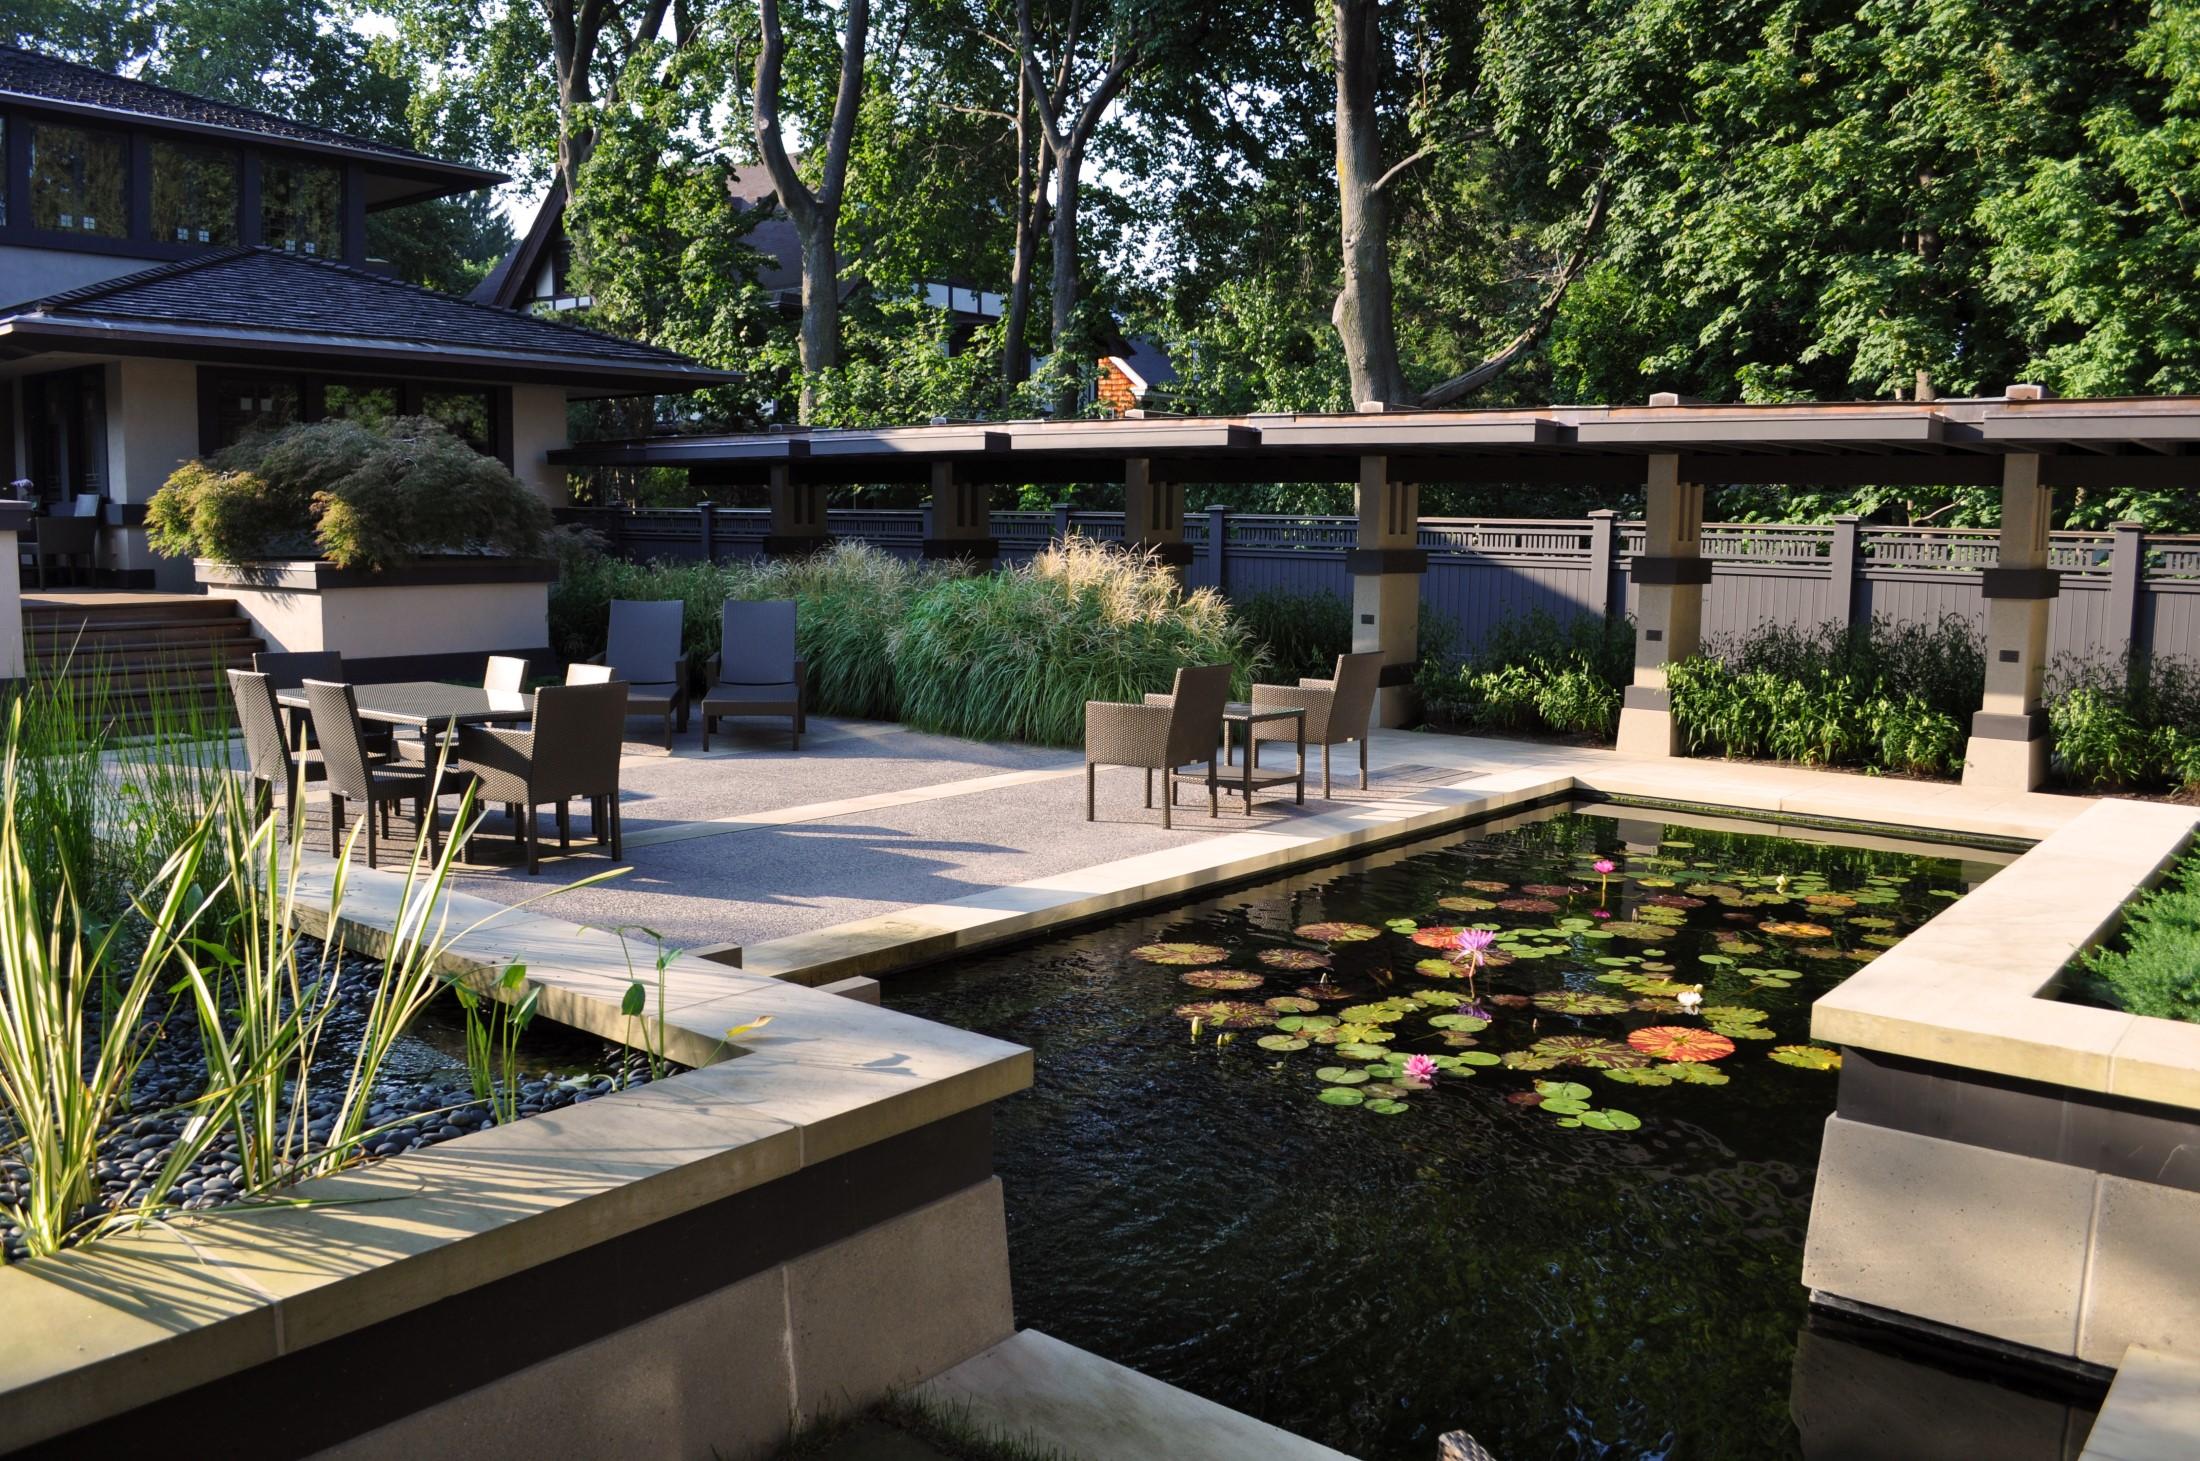 die beste Einstellung akzeptabler Preis 2019 professionell Frank Lloyd Wright's E.E. Boynton House — Bayer Landscape ...